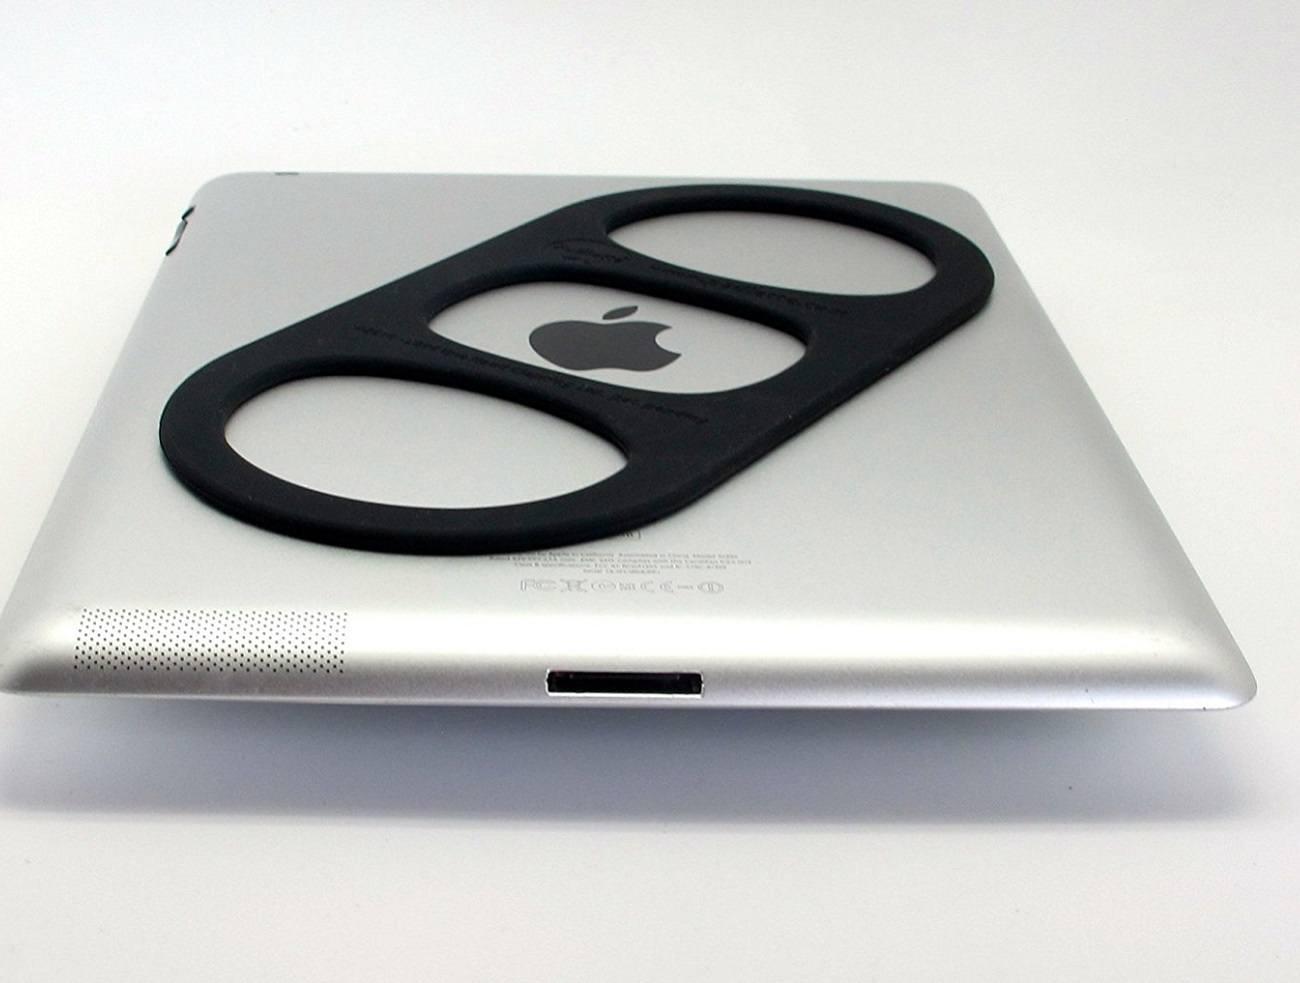 Padlette For iPad